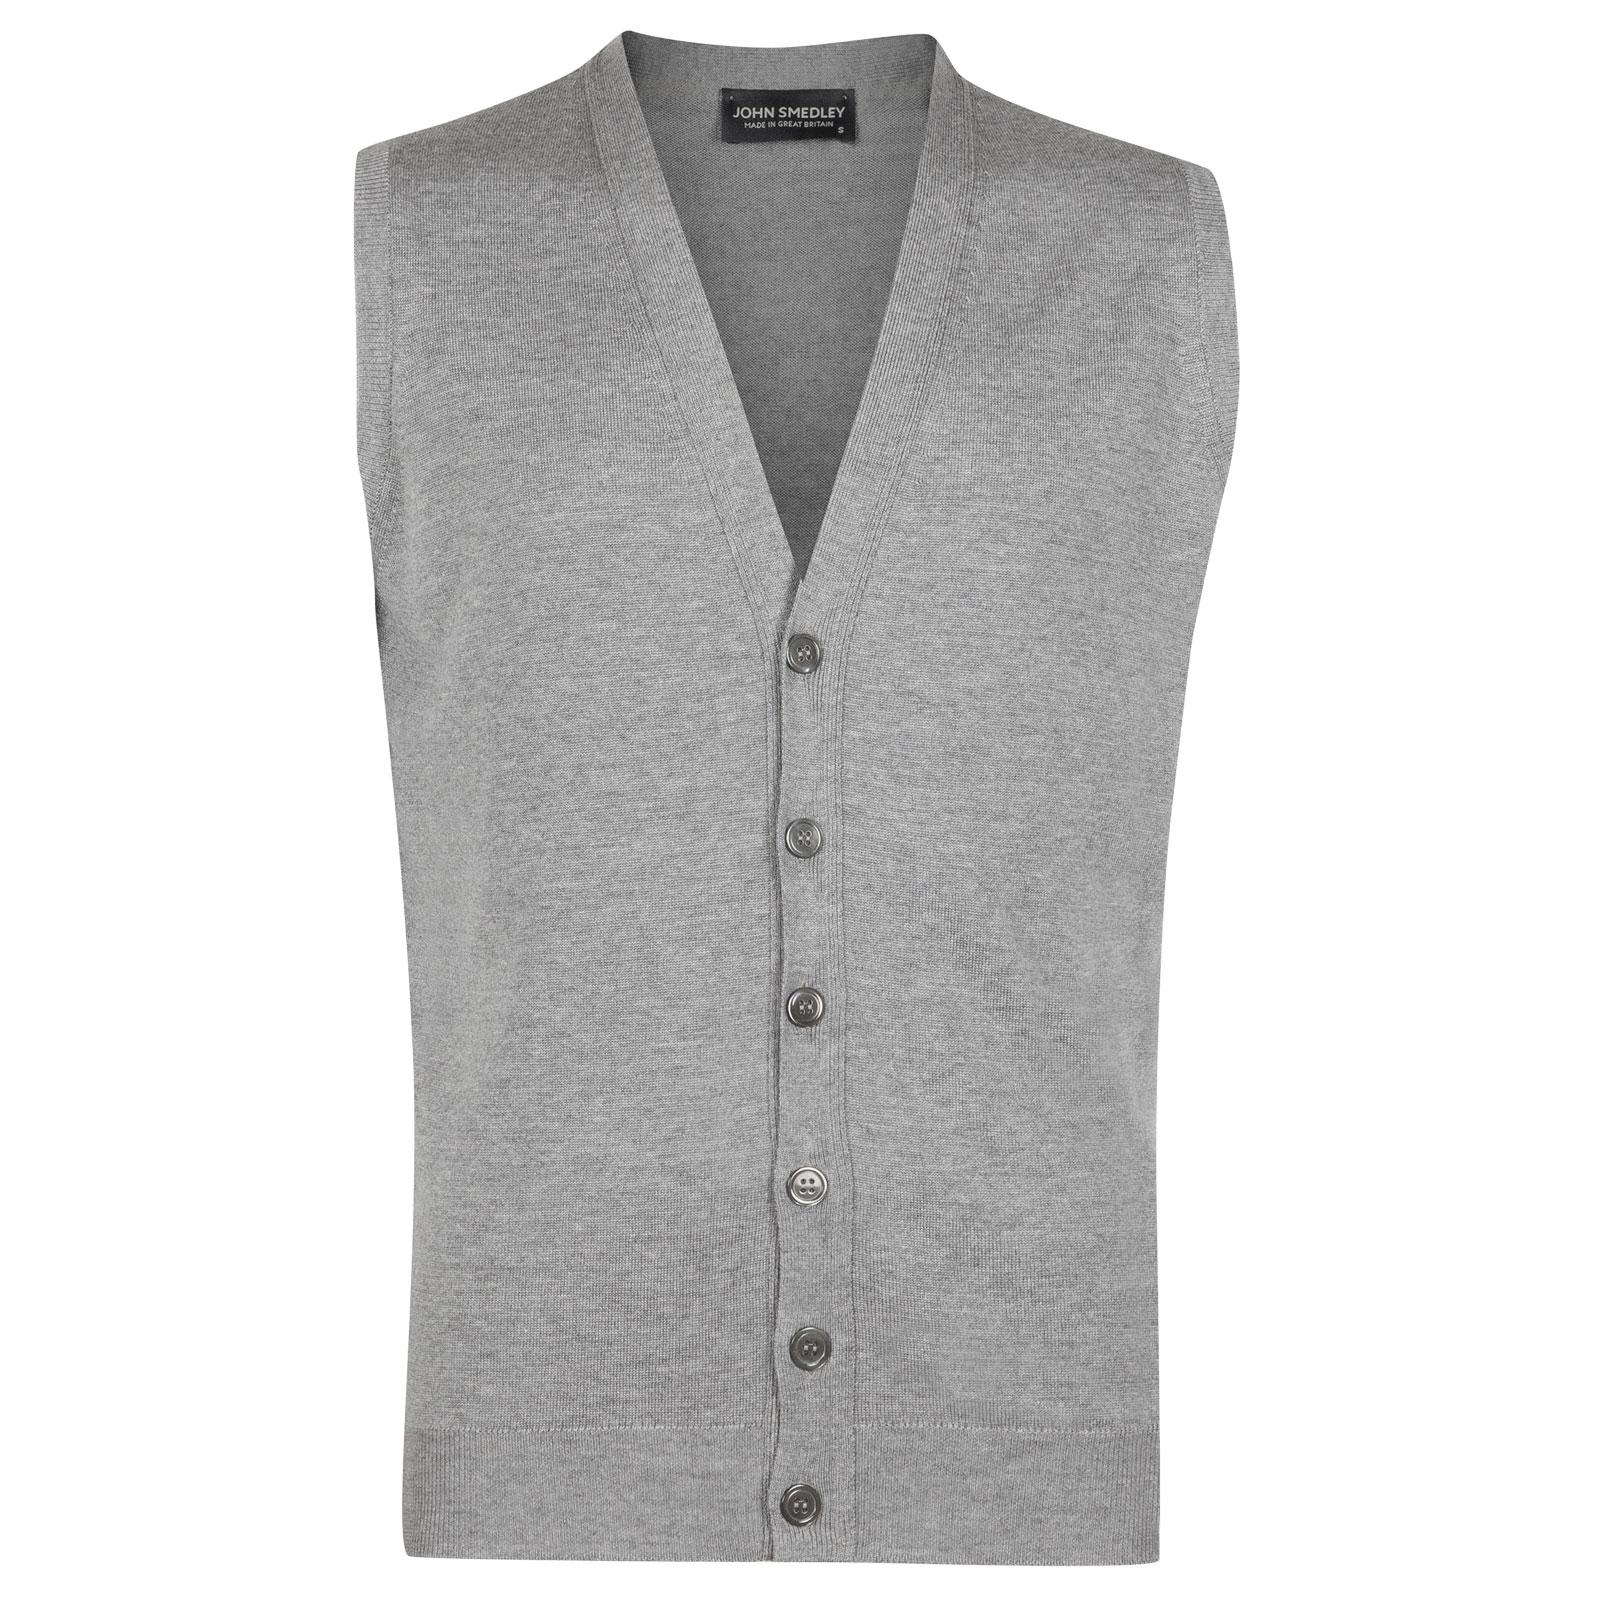 John Smedley stavely Merino Wool Waistcoat in Silver-S